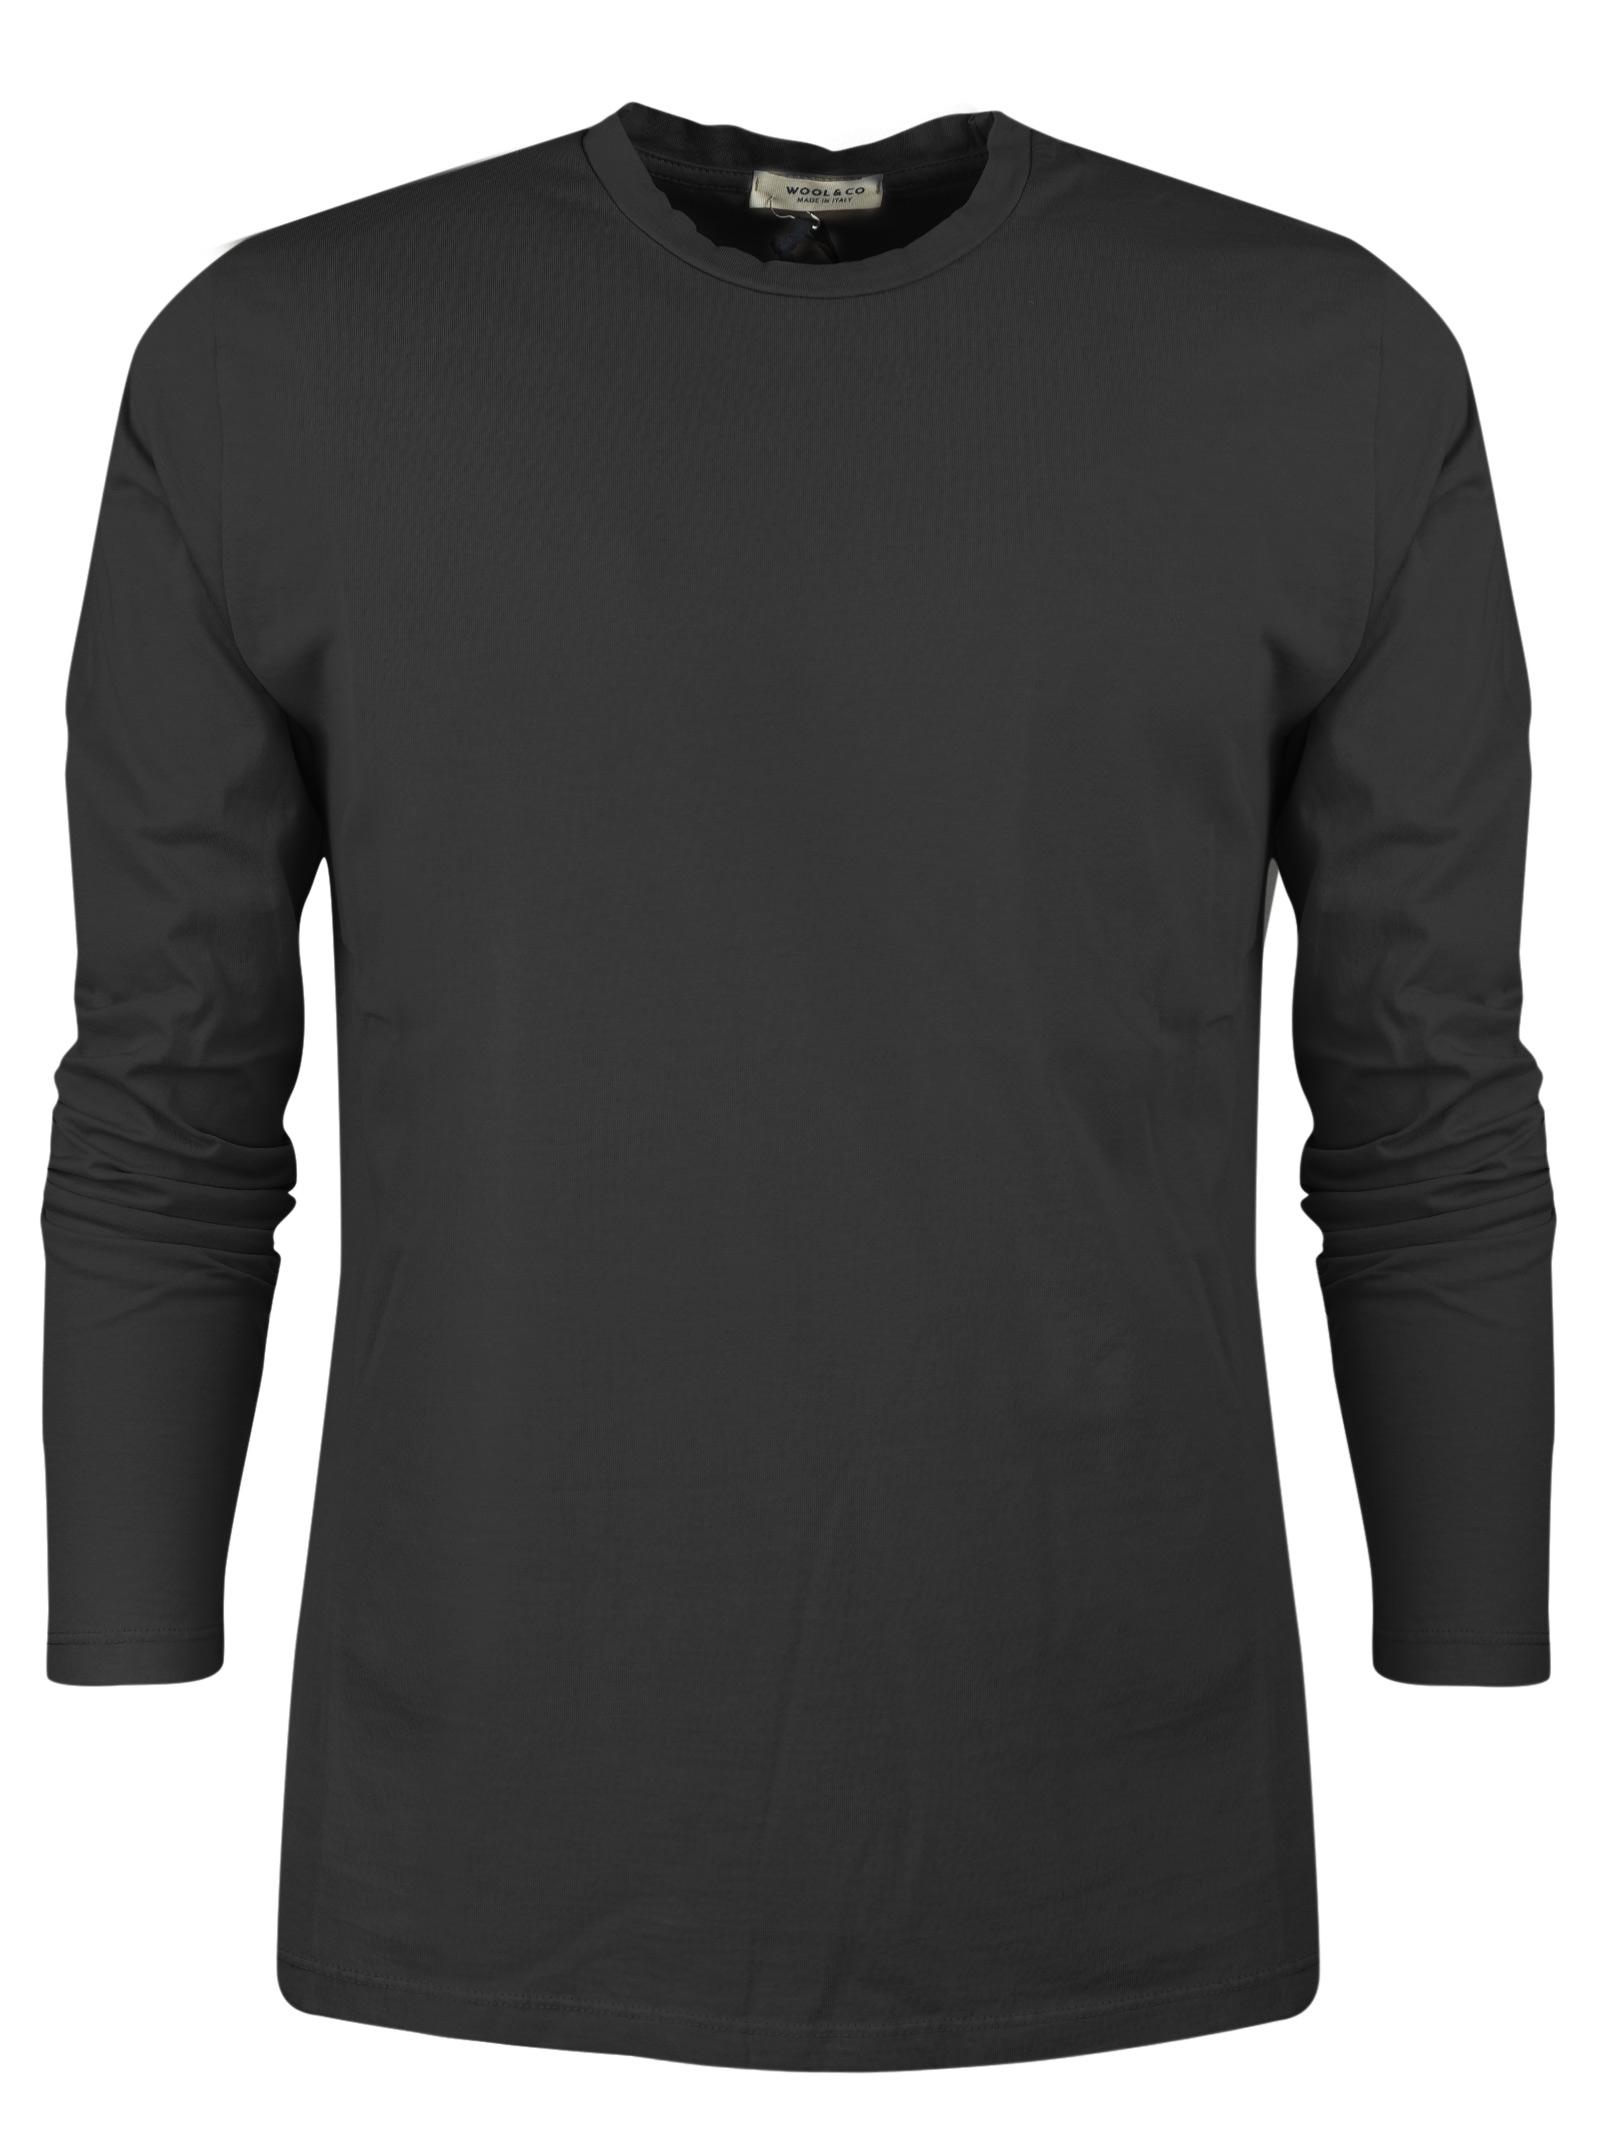 t-shirt manica lunga WOOL & CO.   T- shirt   082610